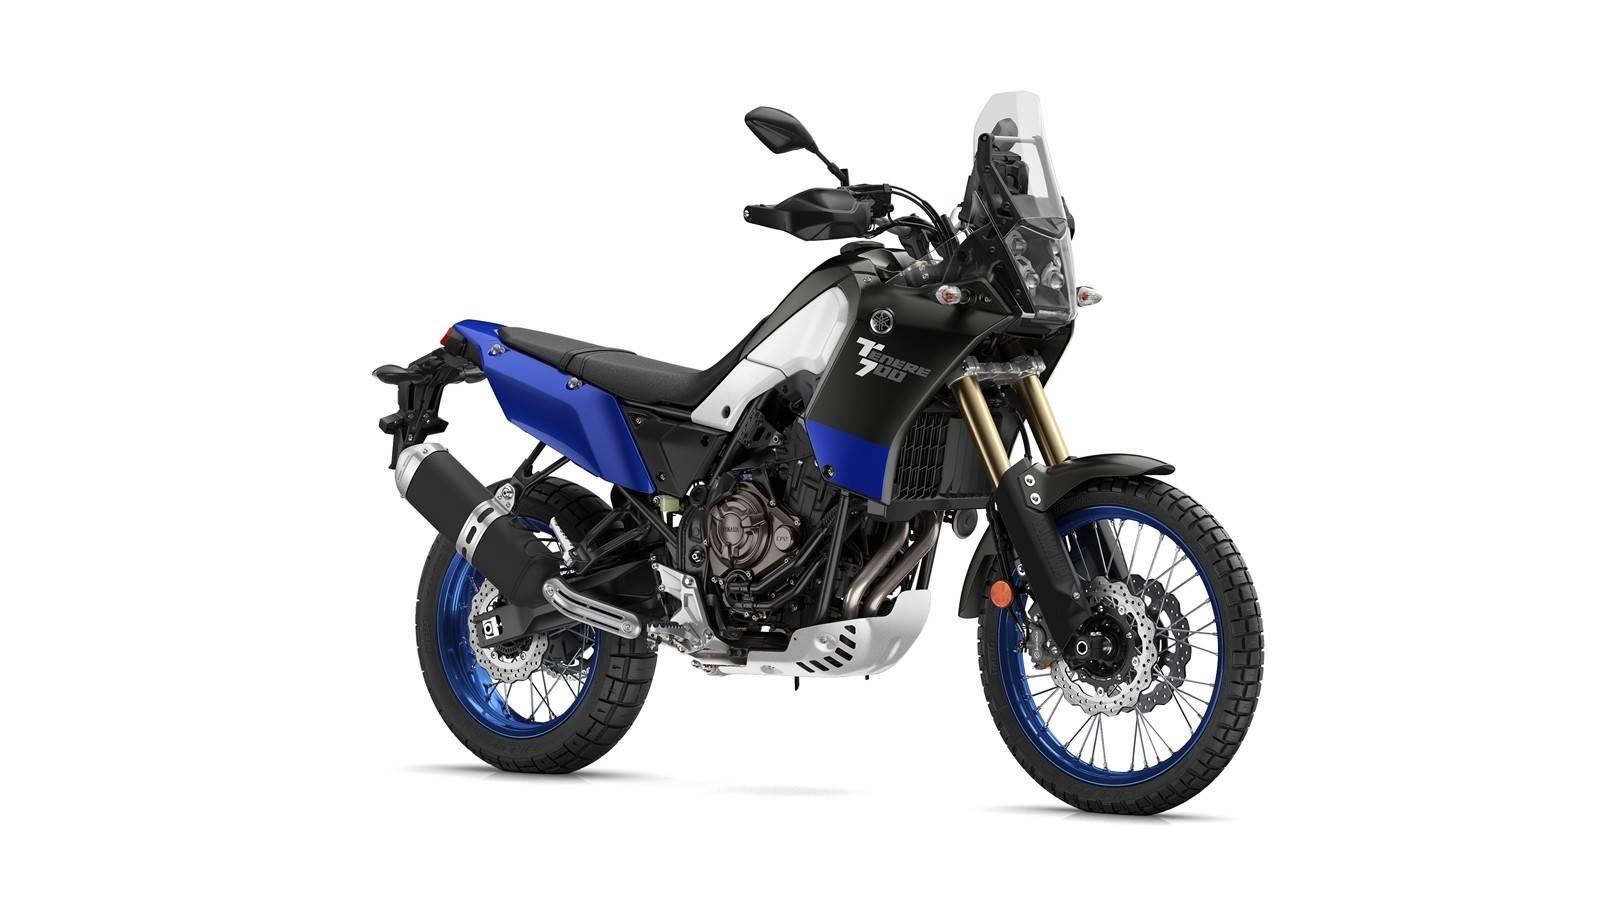 yamaha xtz700 tenere 2019 biru